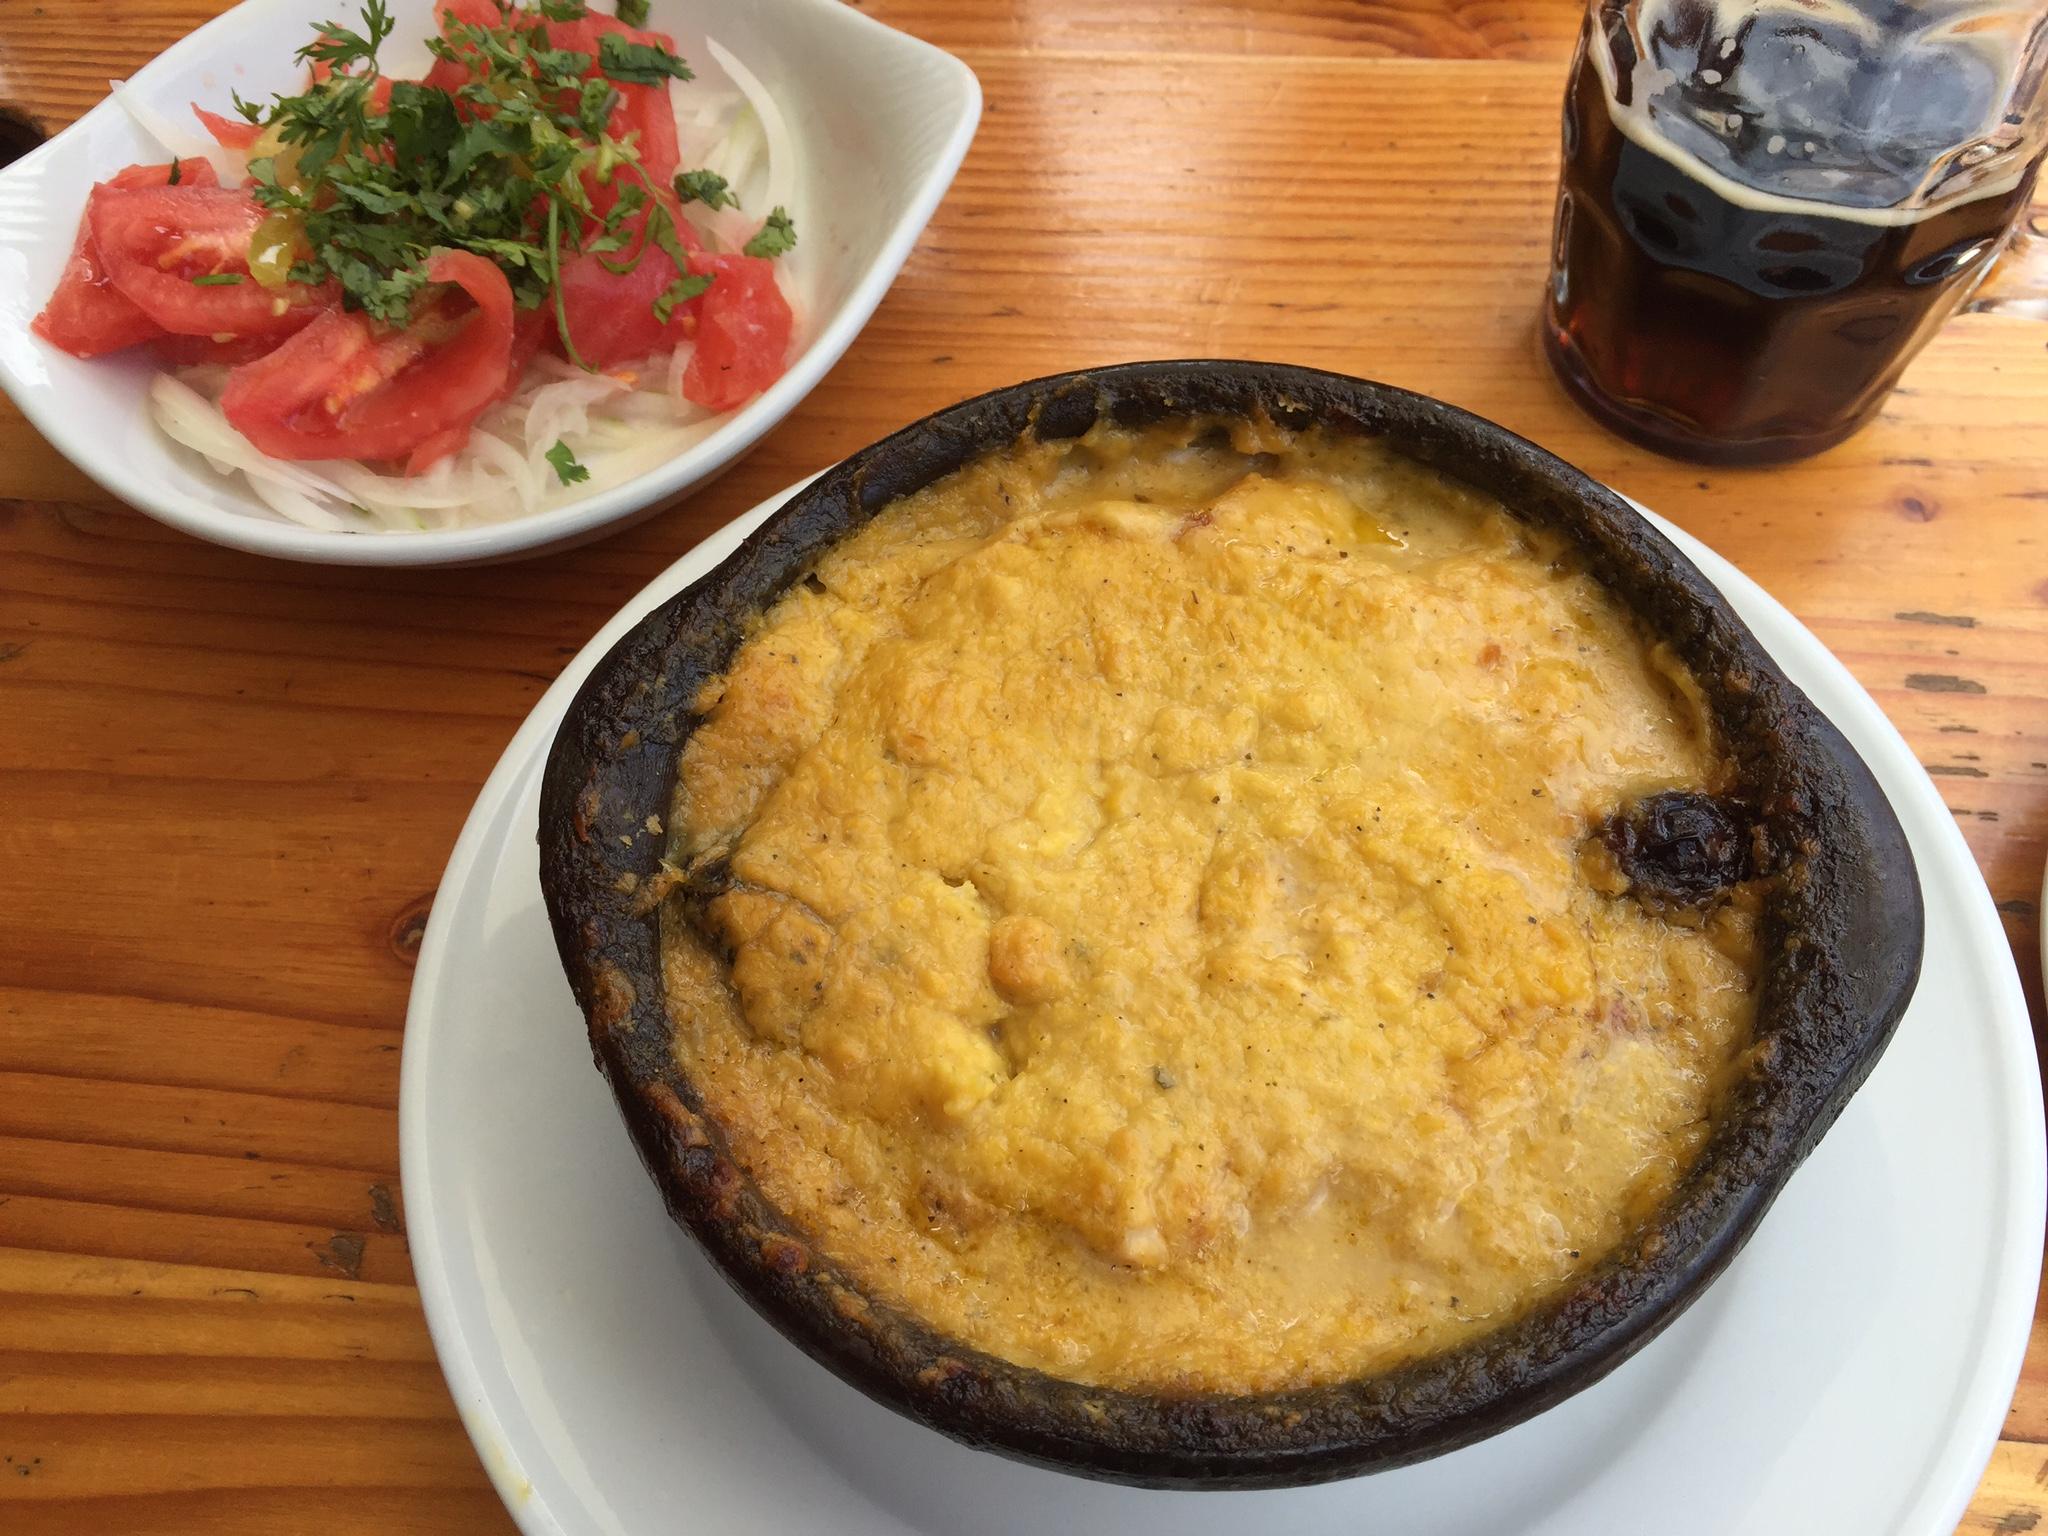 Yvonderweg - Eten in Chili - de lokale keuken - Pastel de choclo